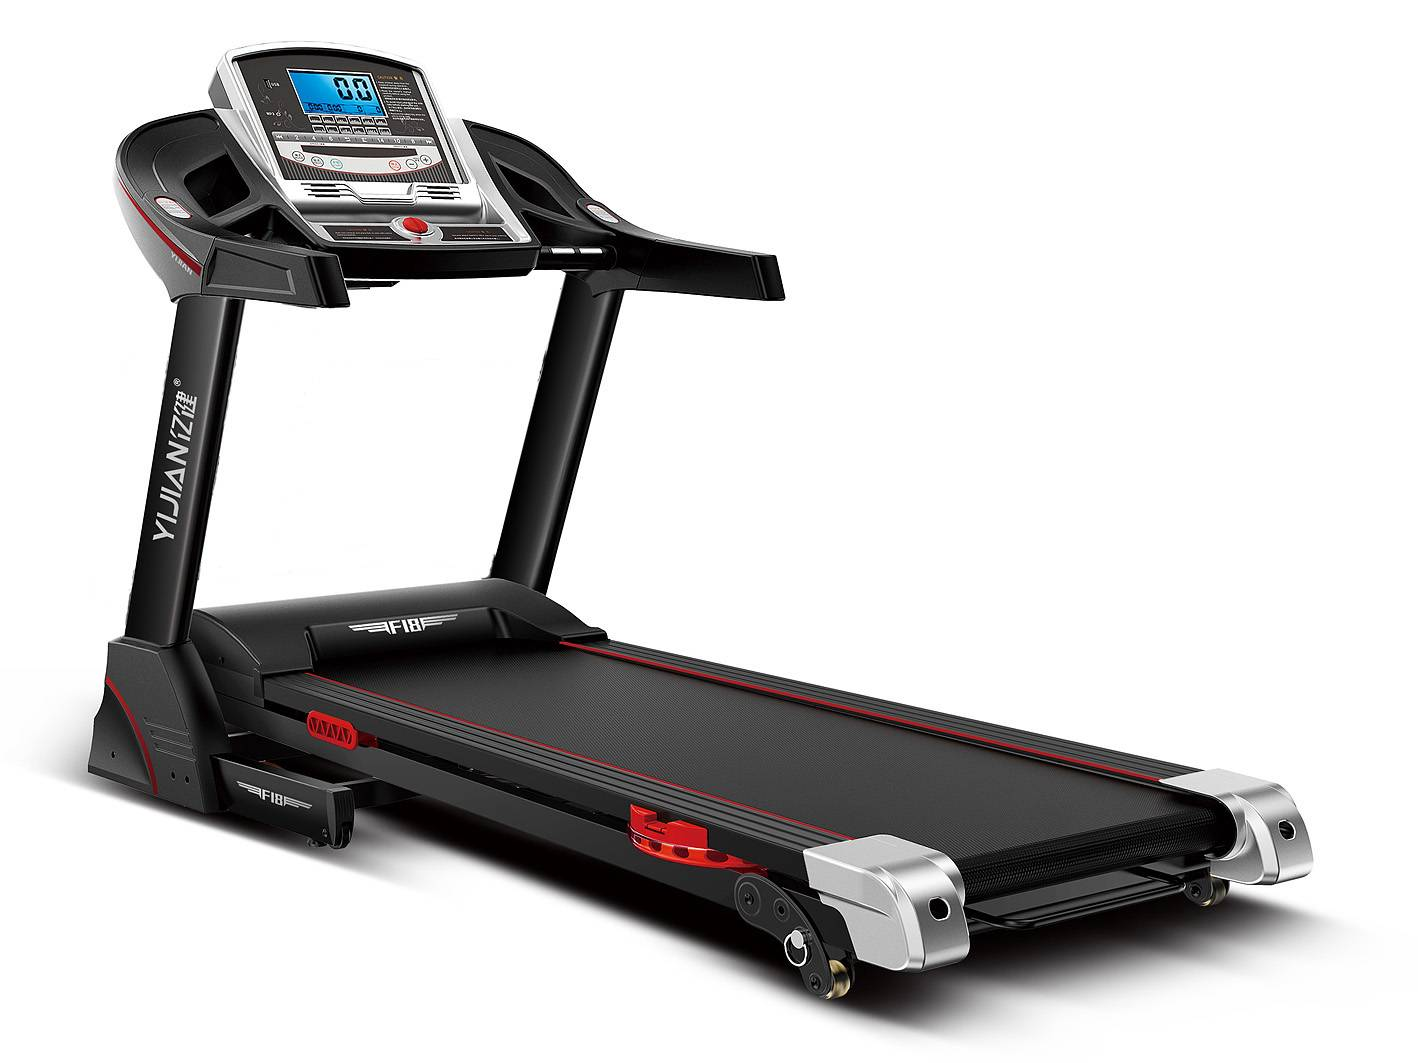 With CE Electric modells treadmill TV Treadmill Incline Motorised folding mini treadmill DK-05AH